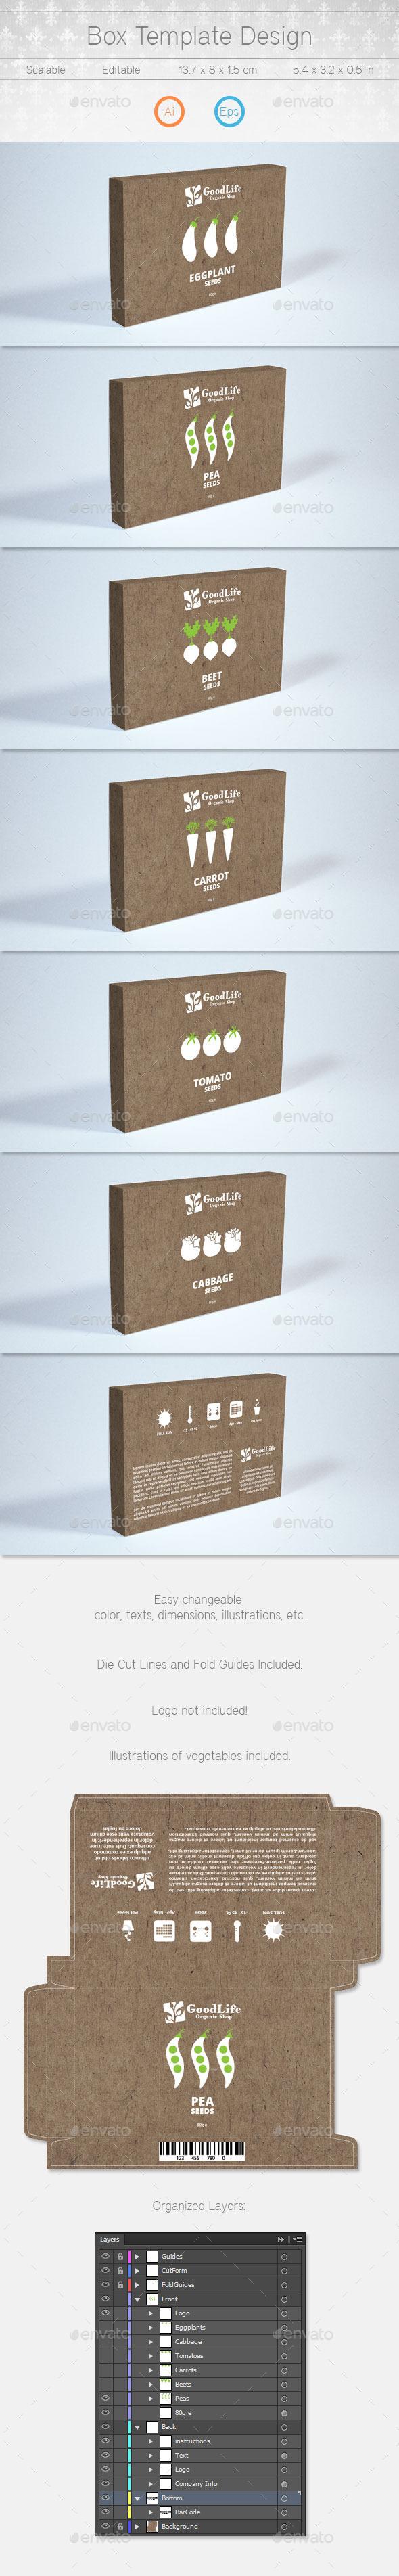 Box Template Design - Packaging Print Templates